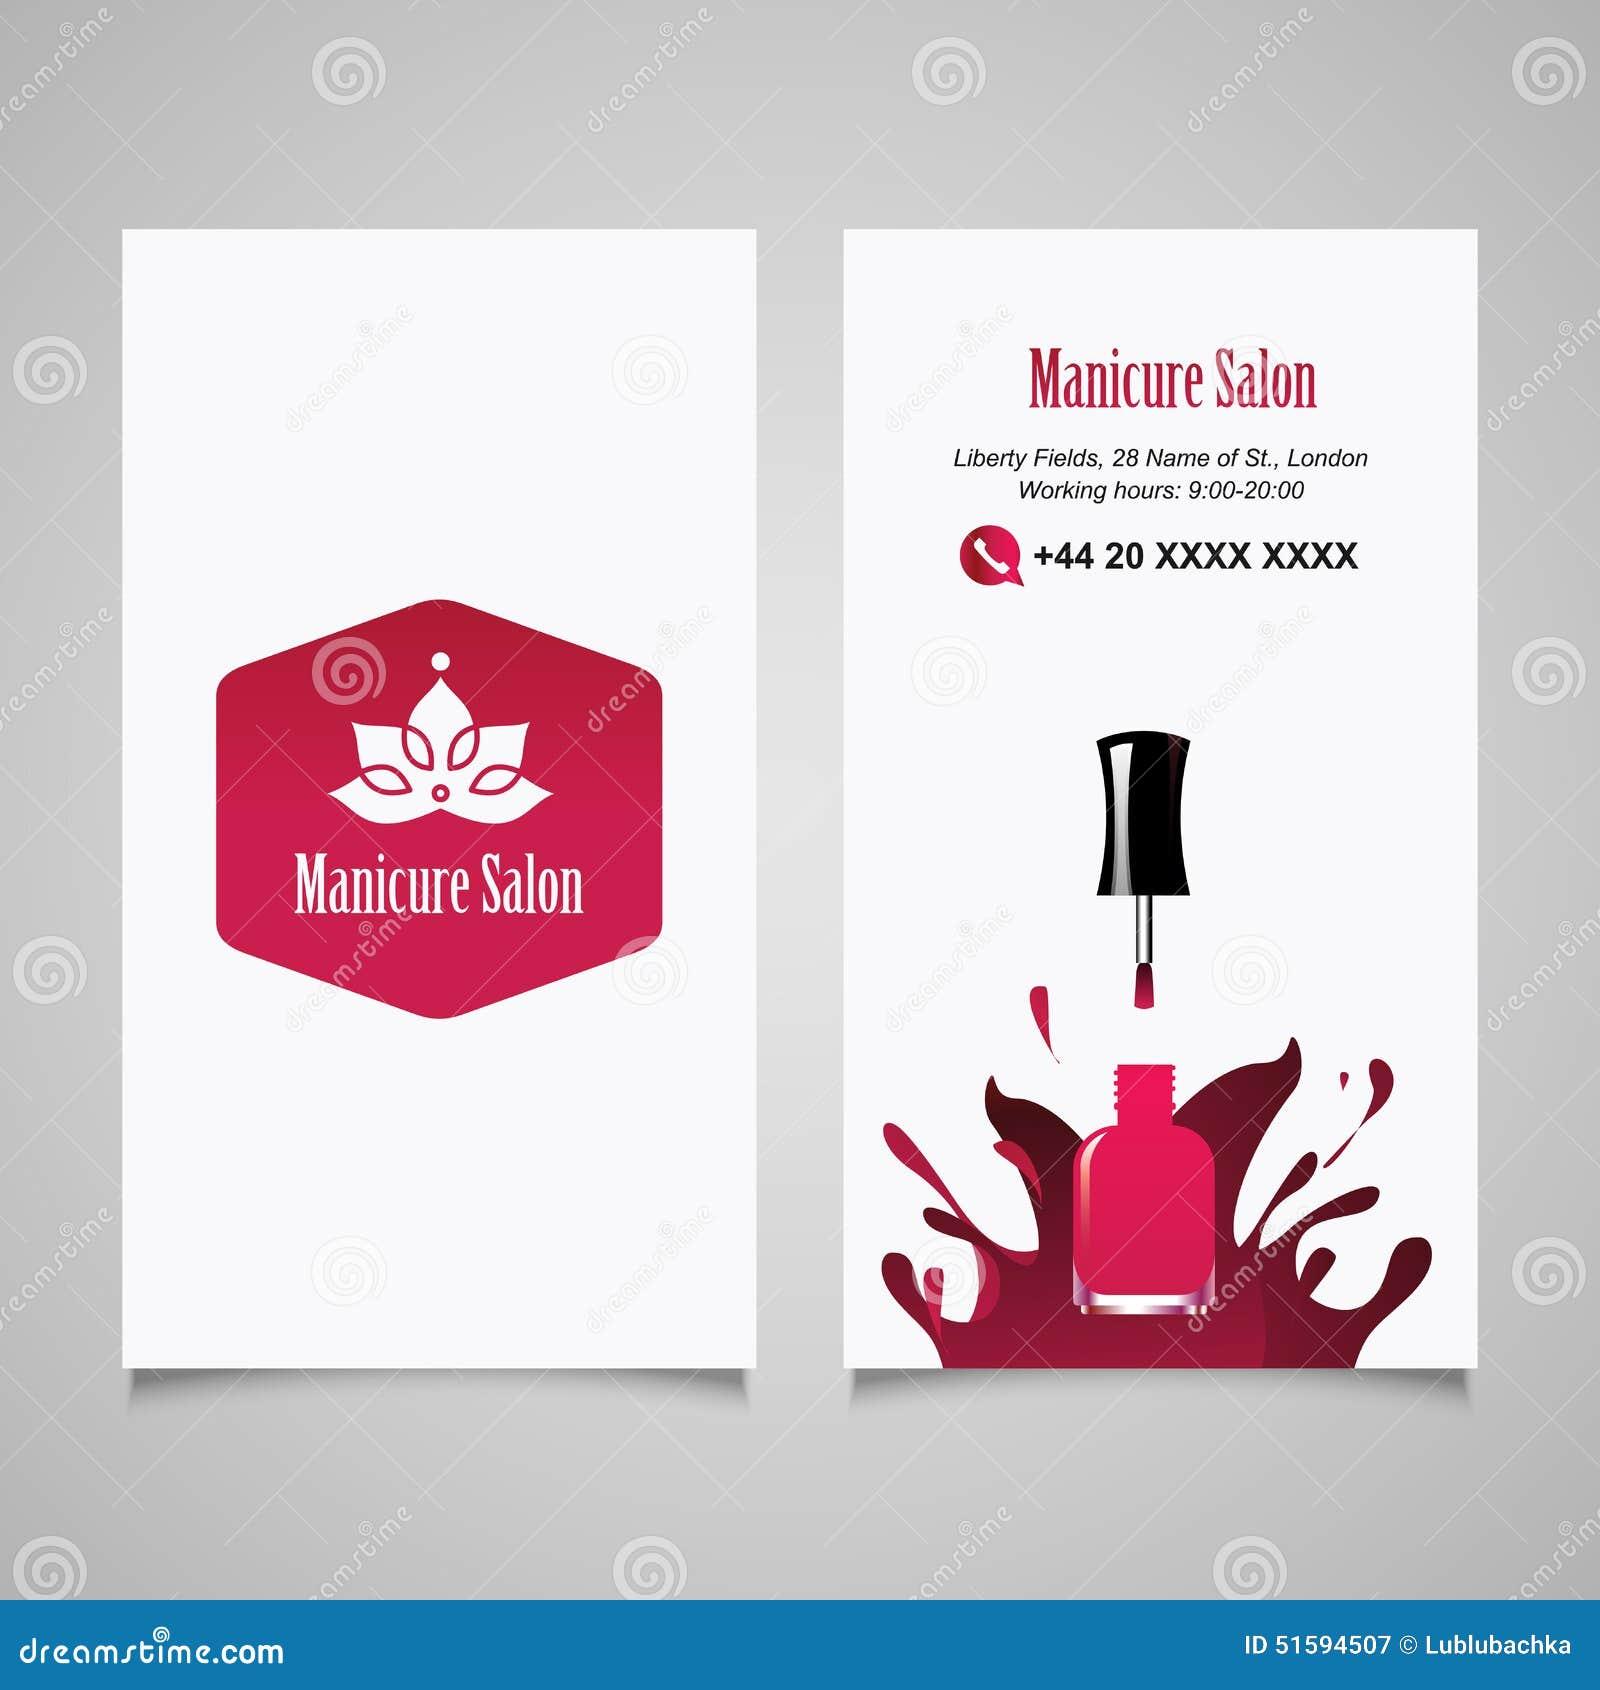 Barber logos business cards